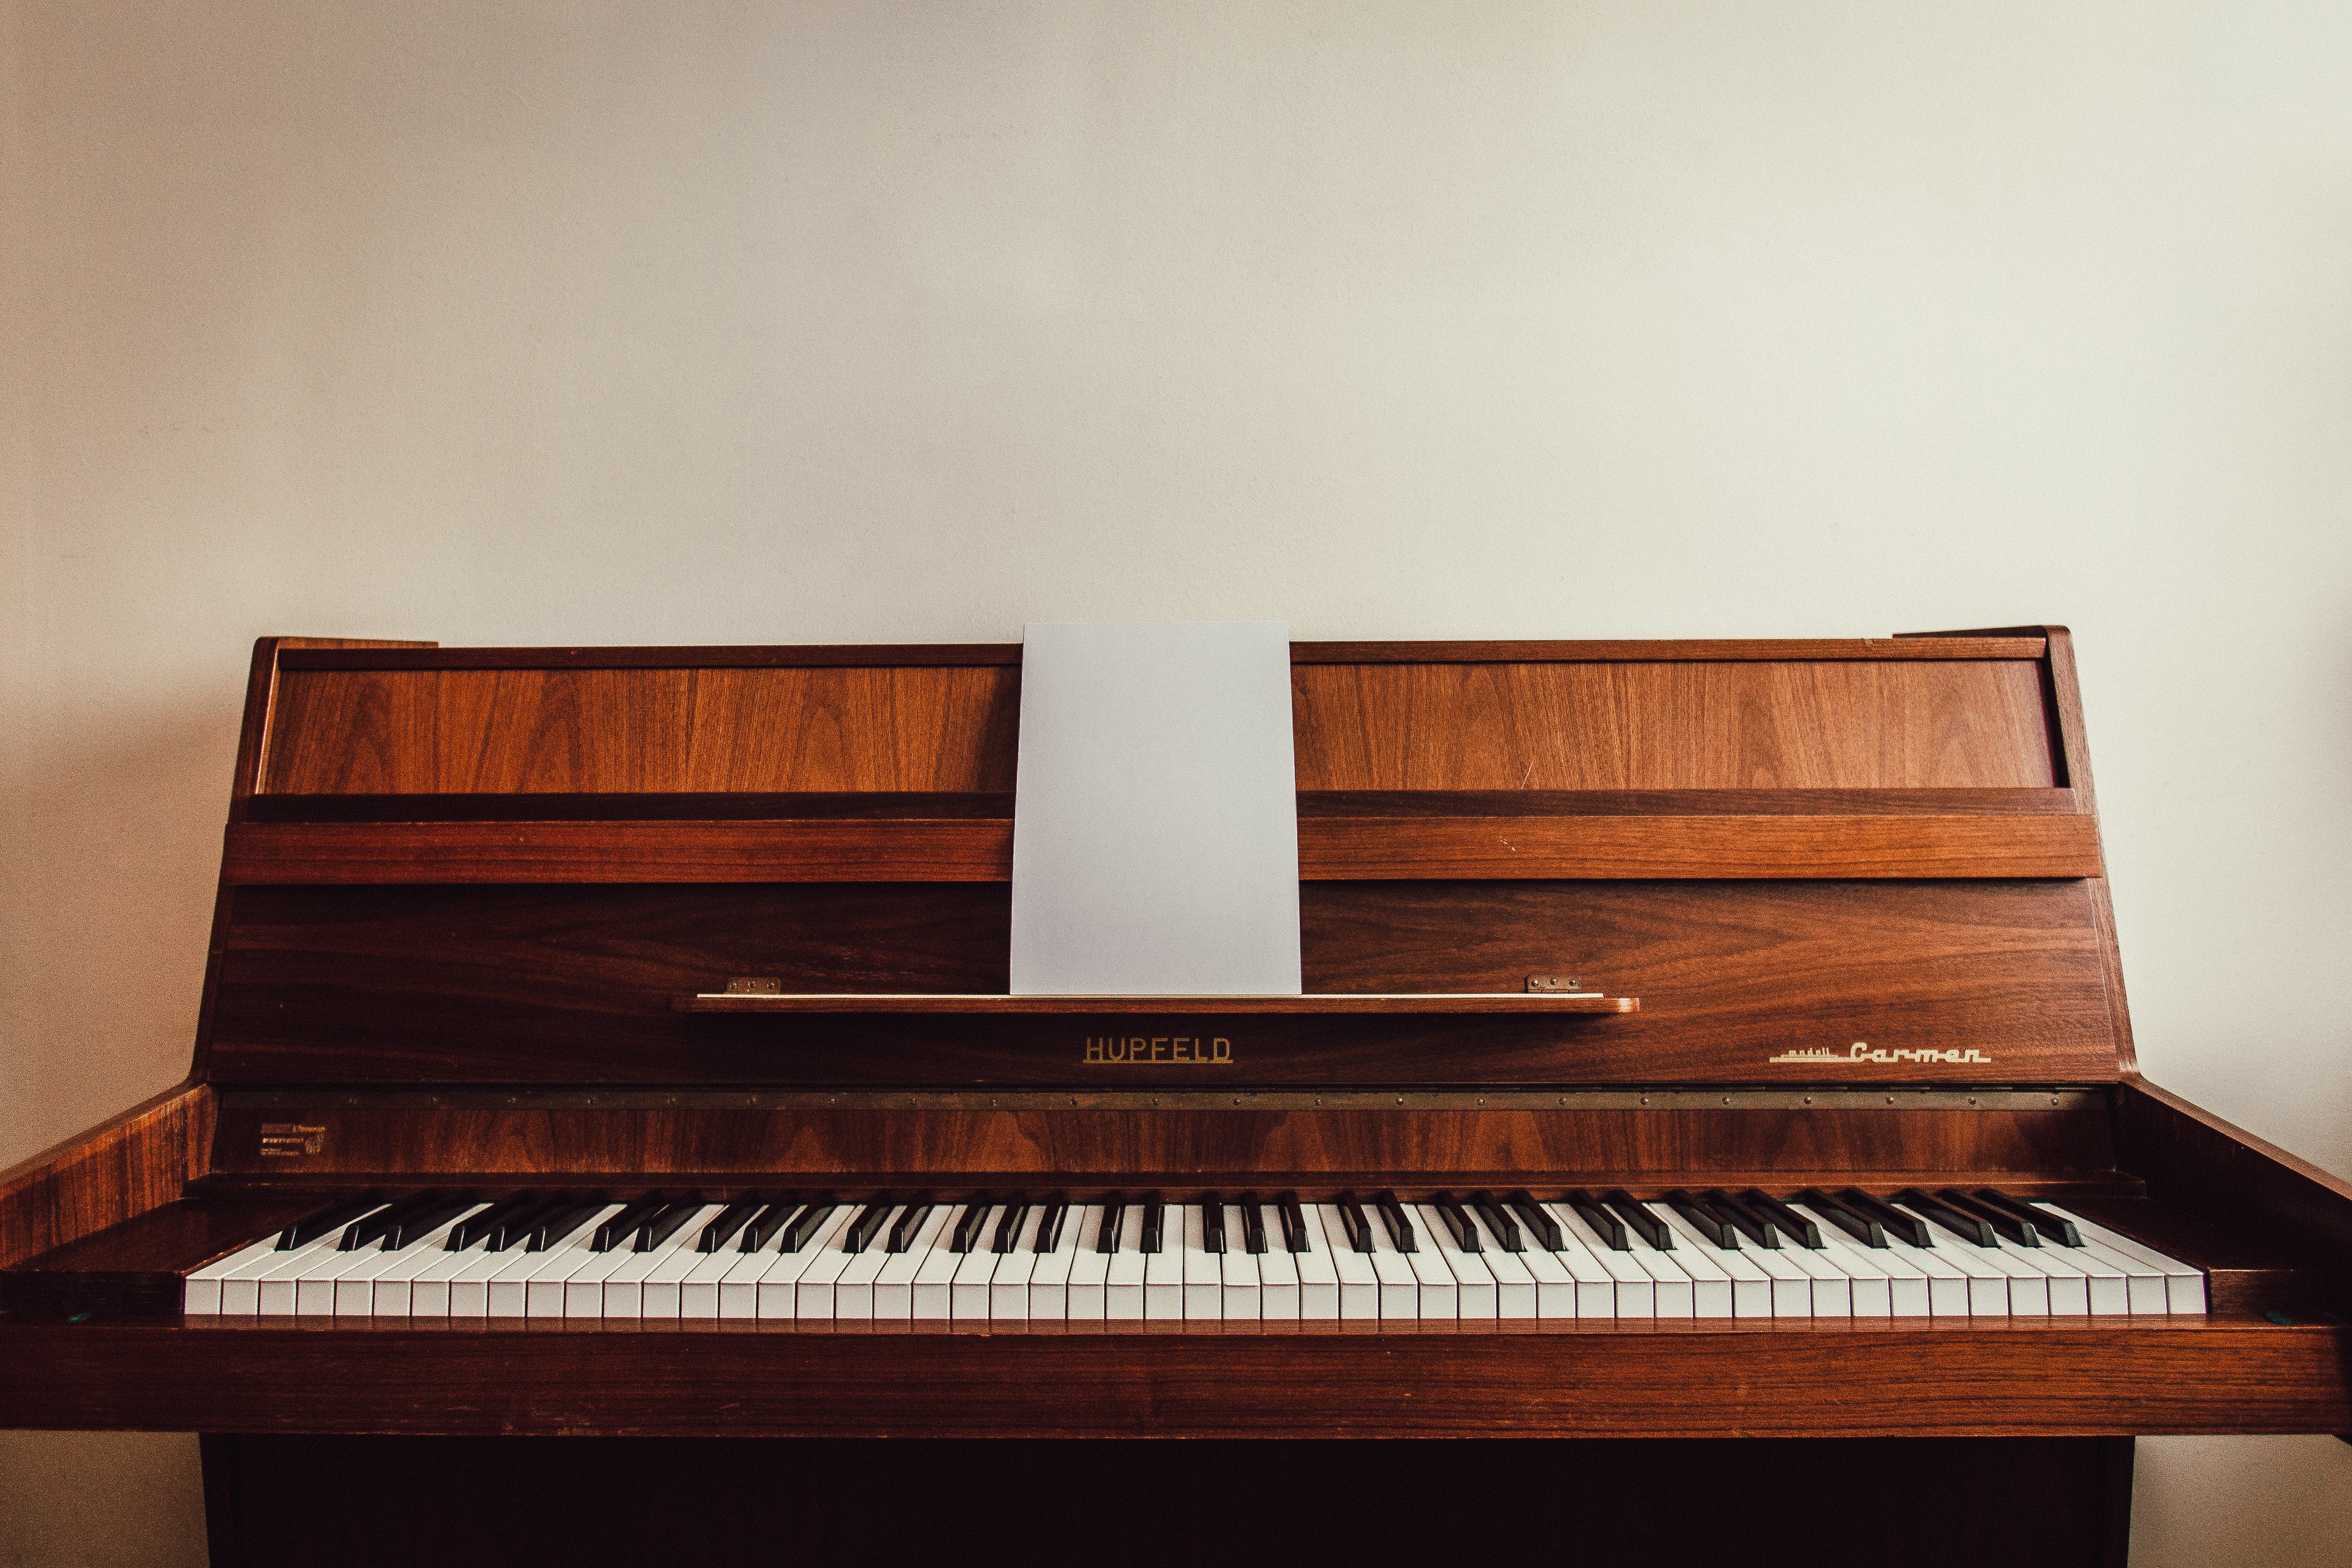 Brown Upright Piano Free Stock Photo